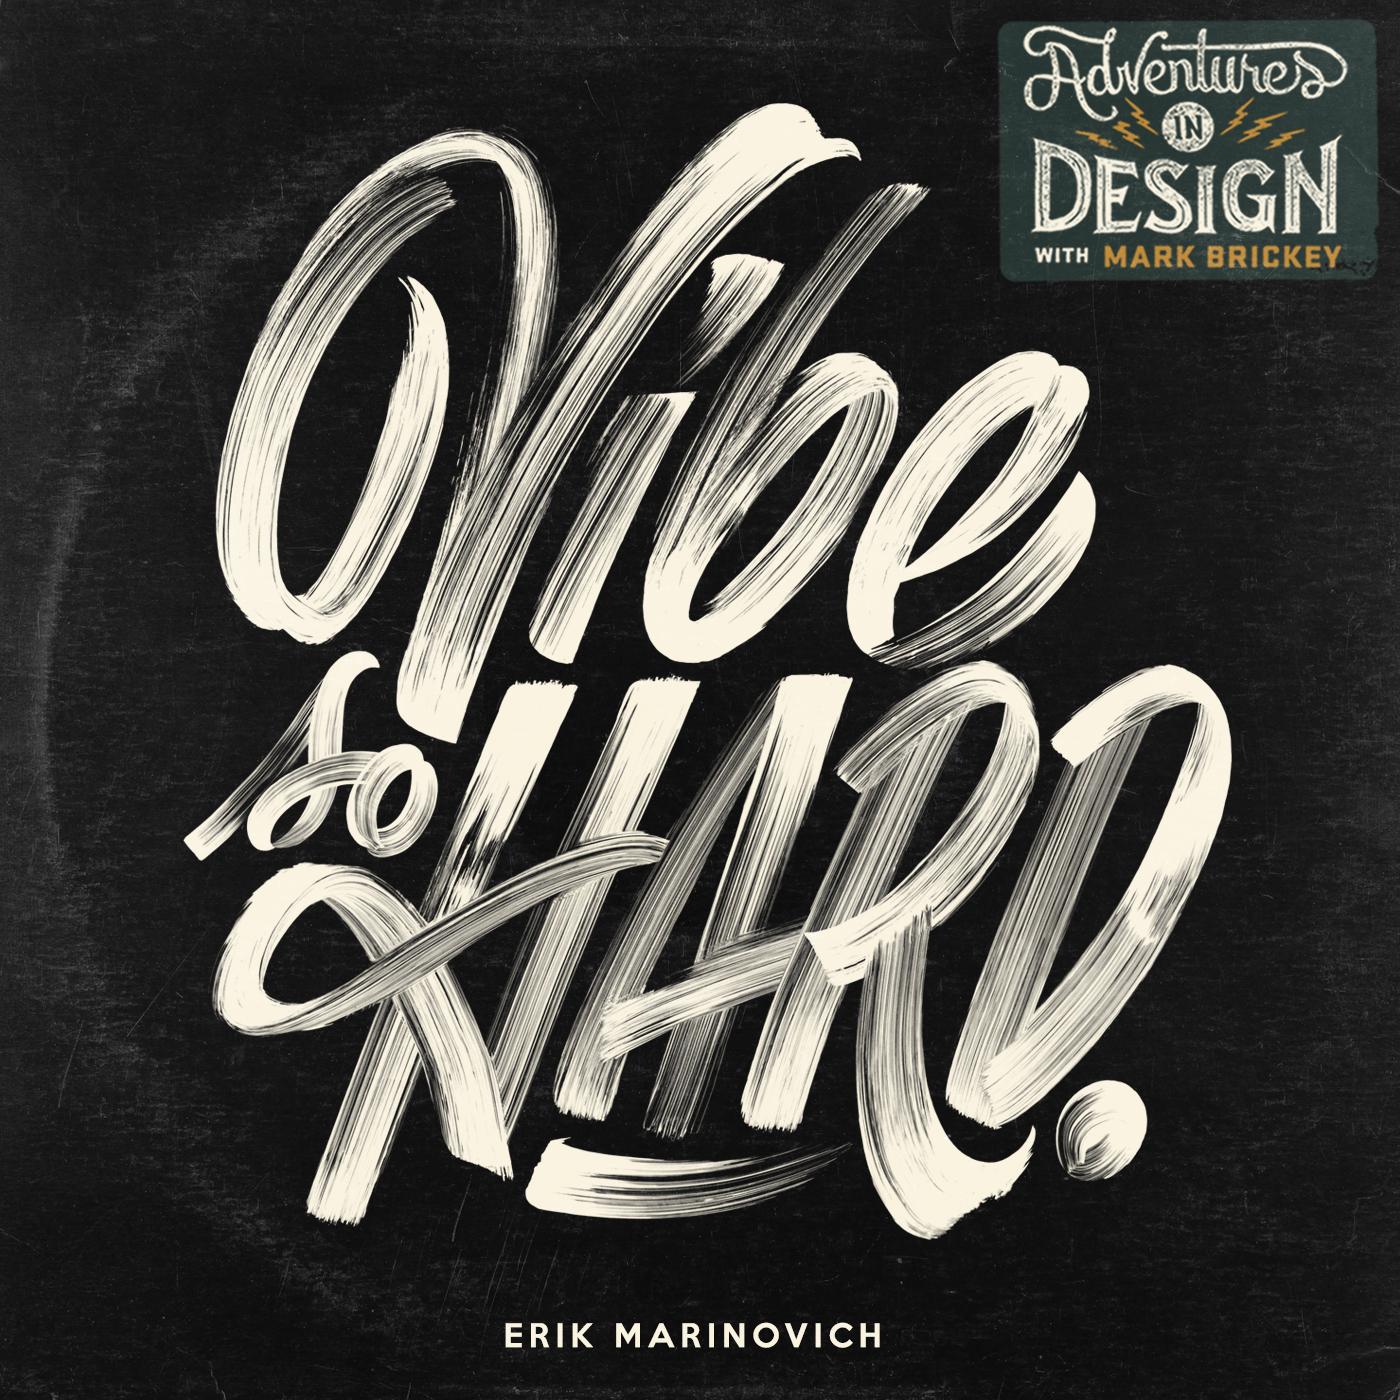 533 - Erik Marinovich